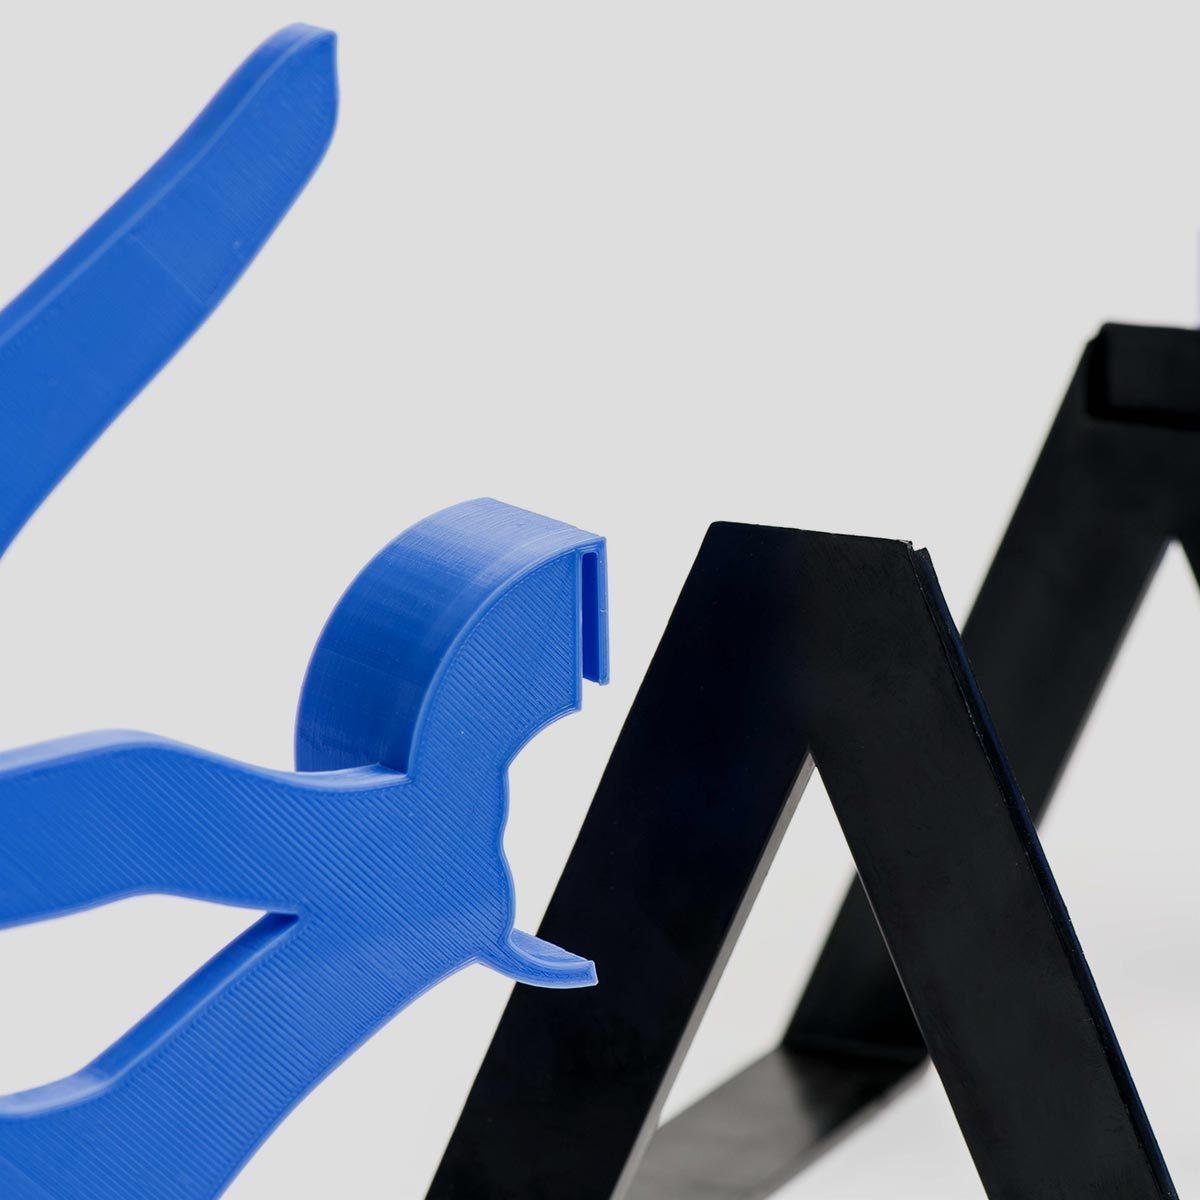 Biblio_06.jpg Download free STL file Biblio - Bookends • 3D printable model, EUMAKERS